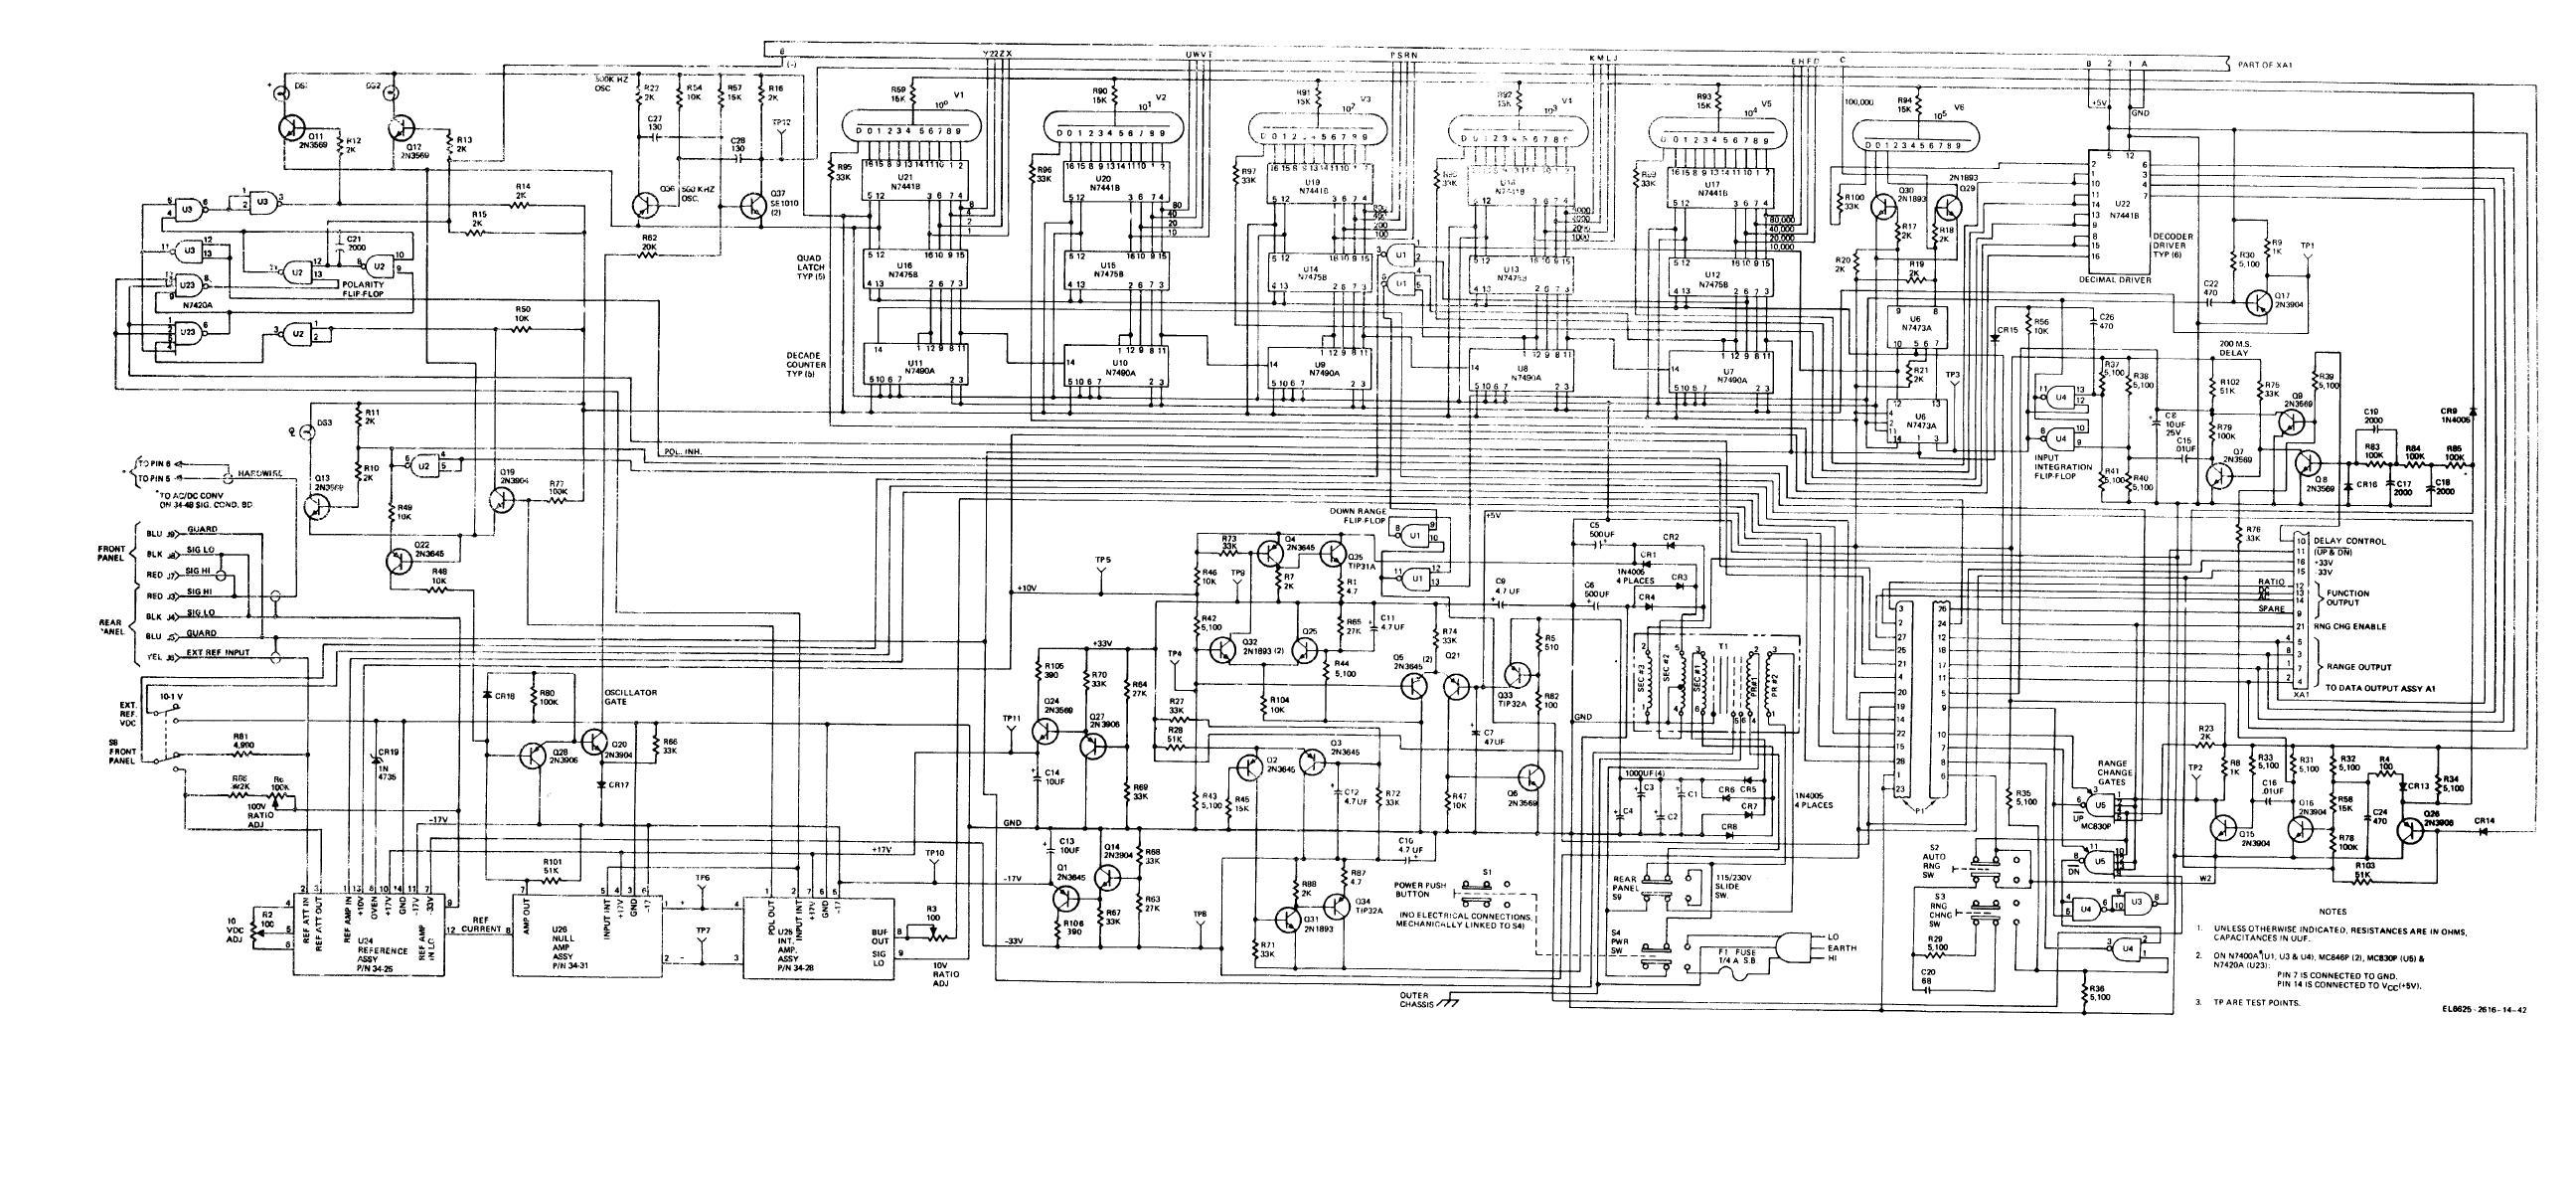 Samsung Refrigerator Diagram Rf217acbp Wiring